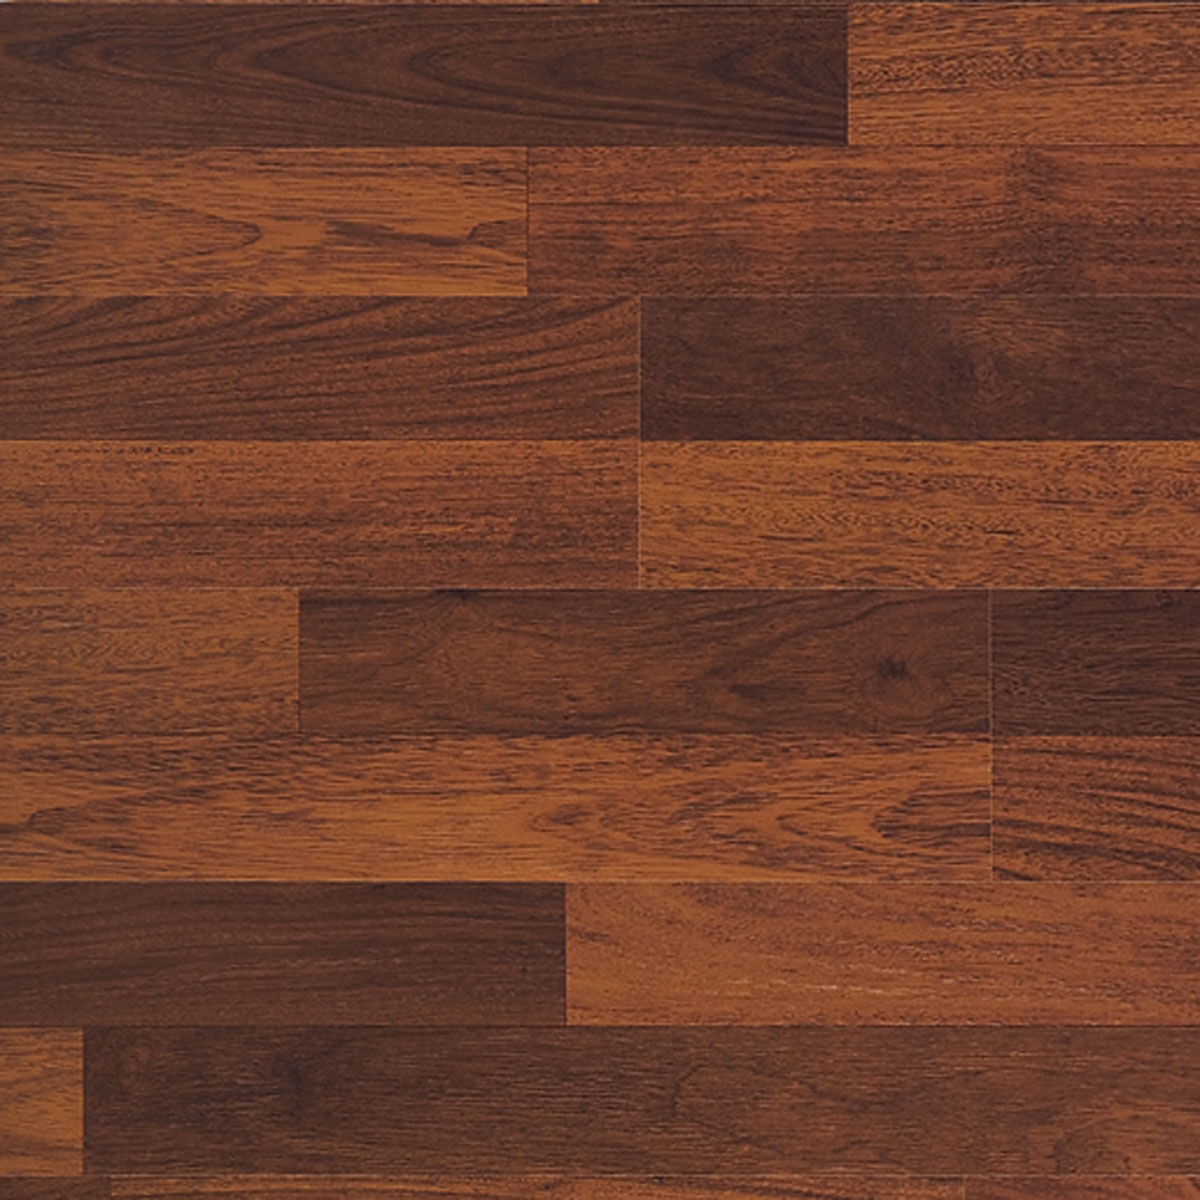 laminated wooden flooring photo - 2 BNERTCD